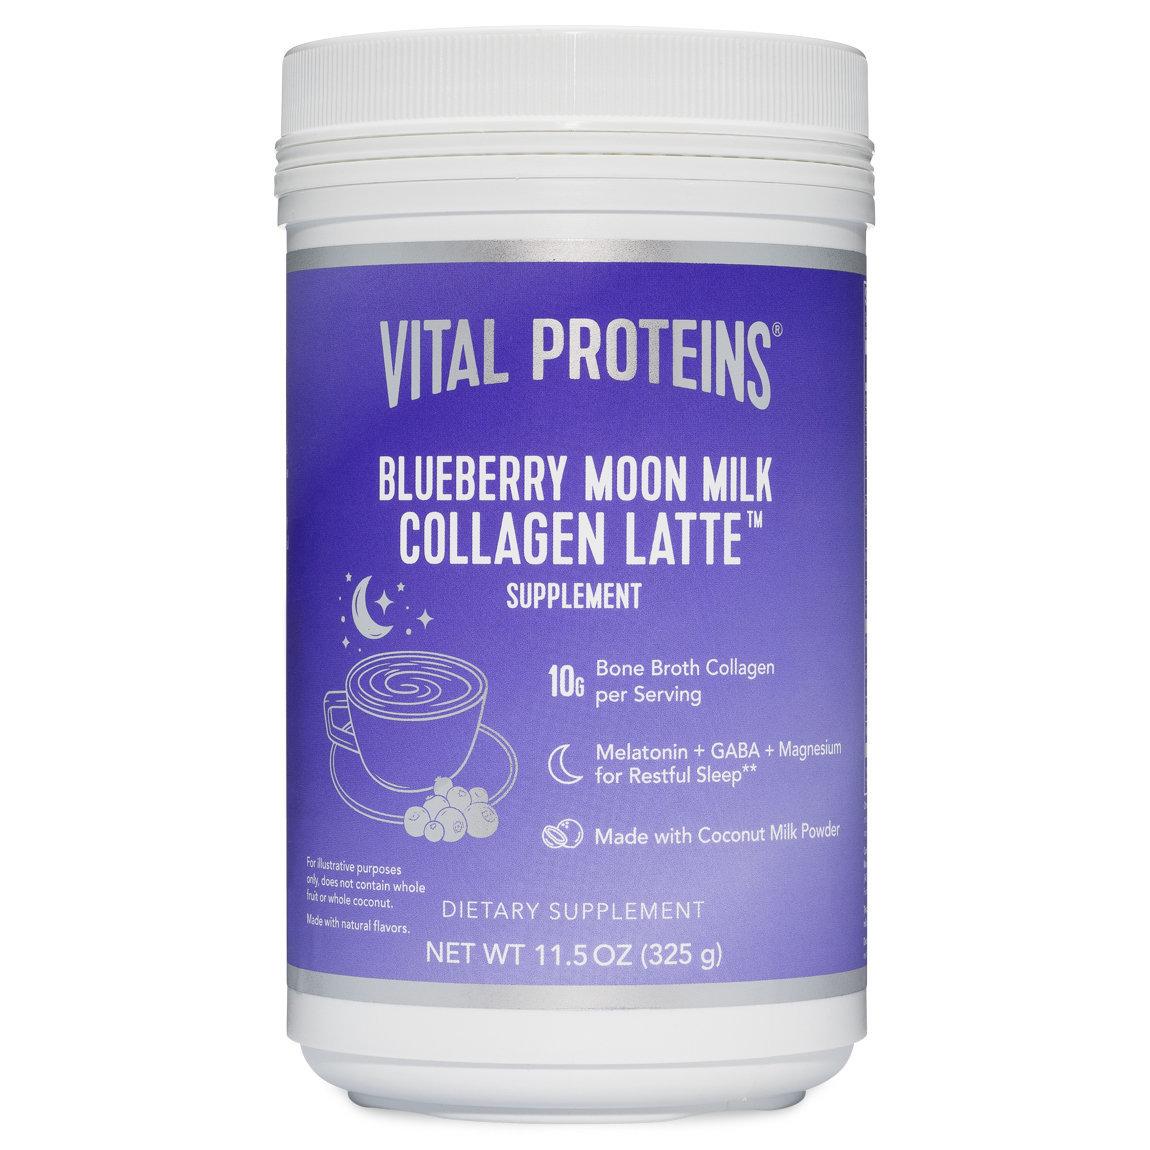 Vital Proteins Blueberry Moon Milk Collagen Latte product swatch.